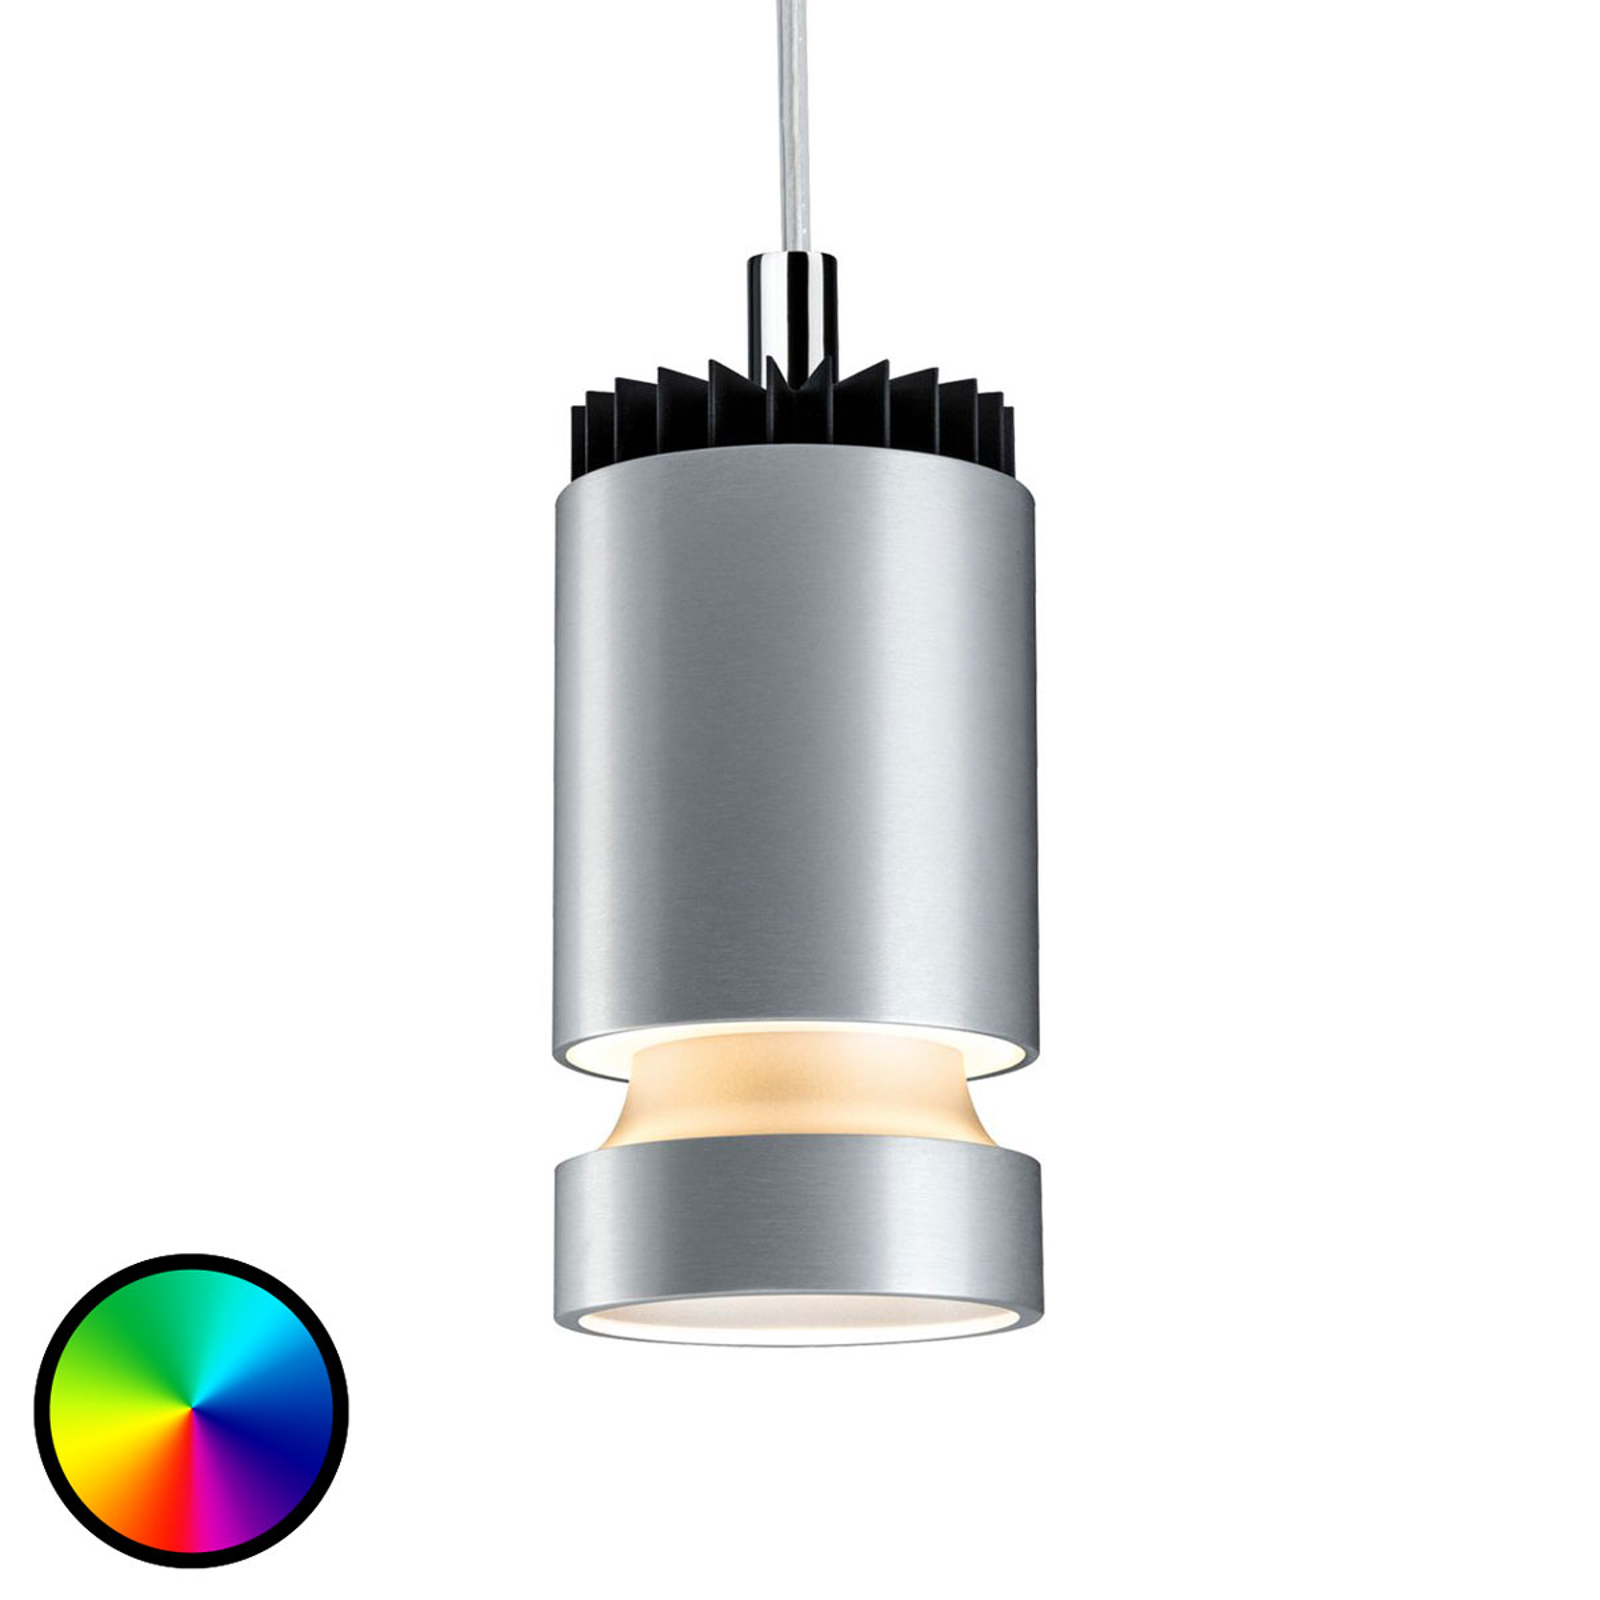 Paulmann VariLine suspension LED Shine, 2700K